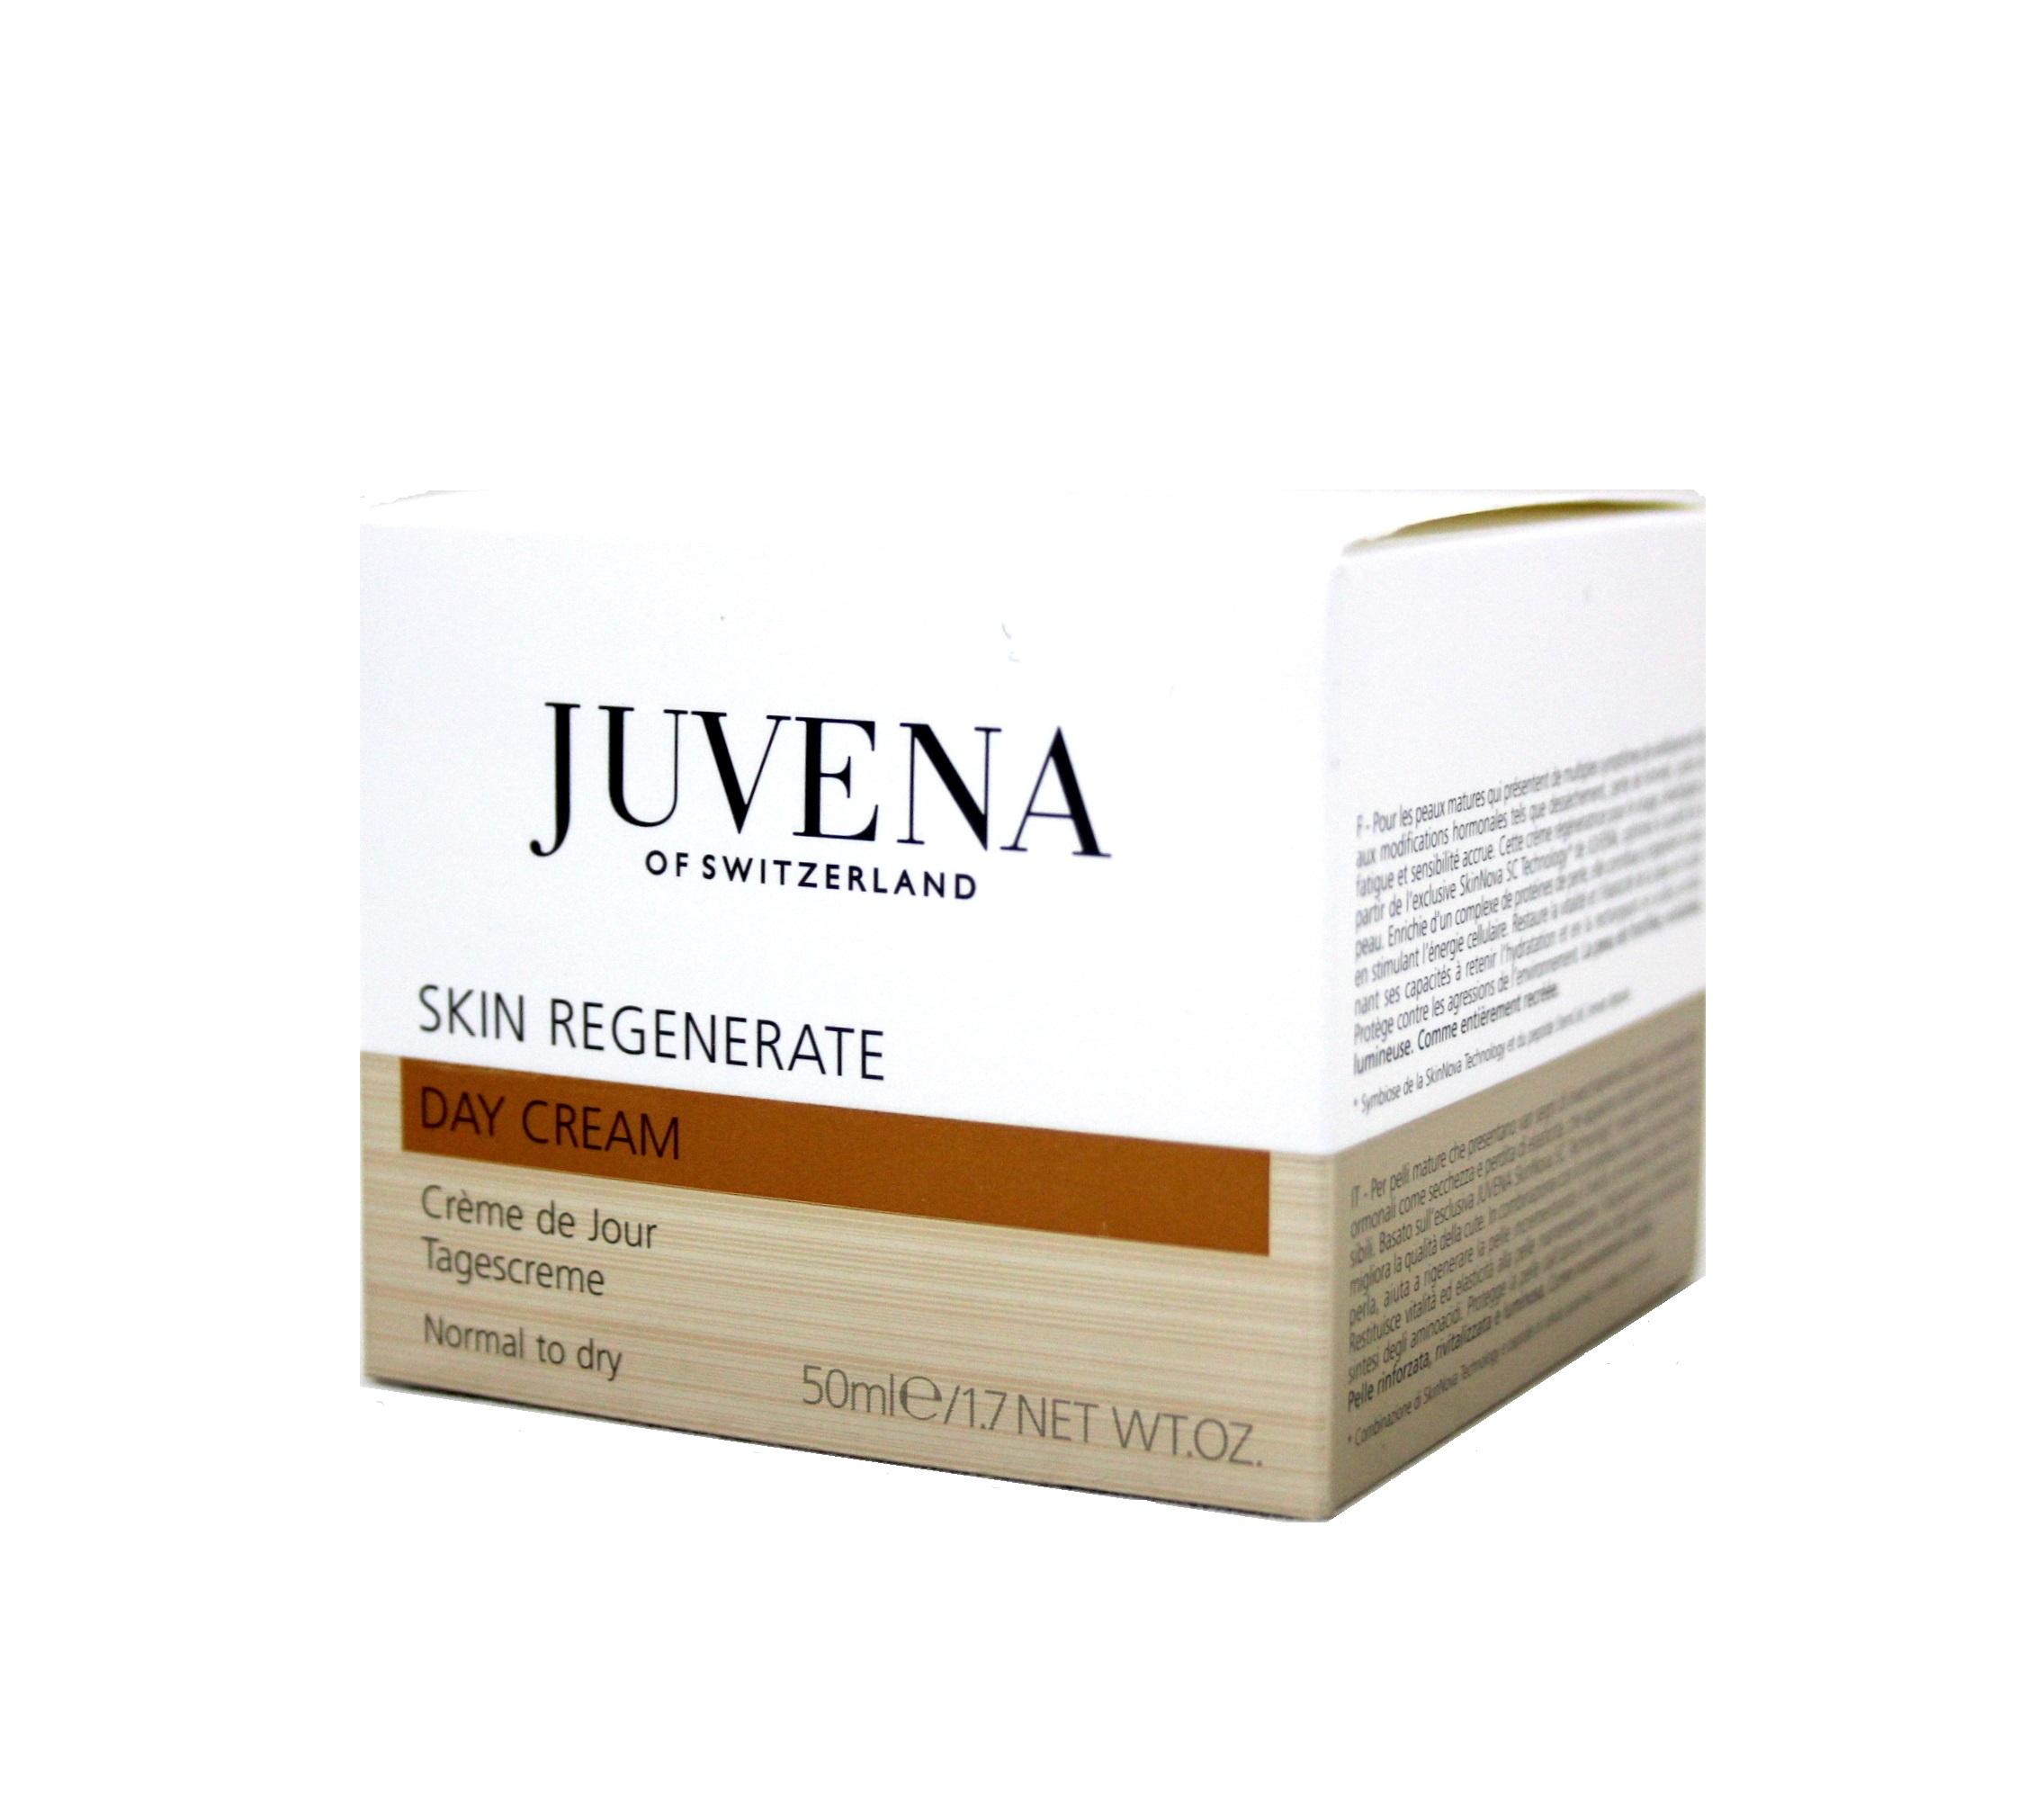 Juvena Skin Regenerate And Restore Day Cream